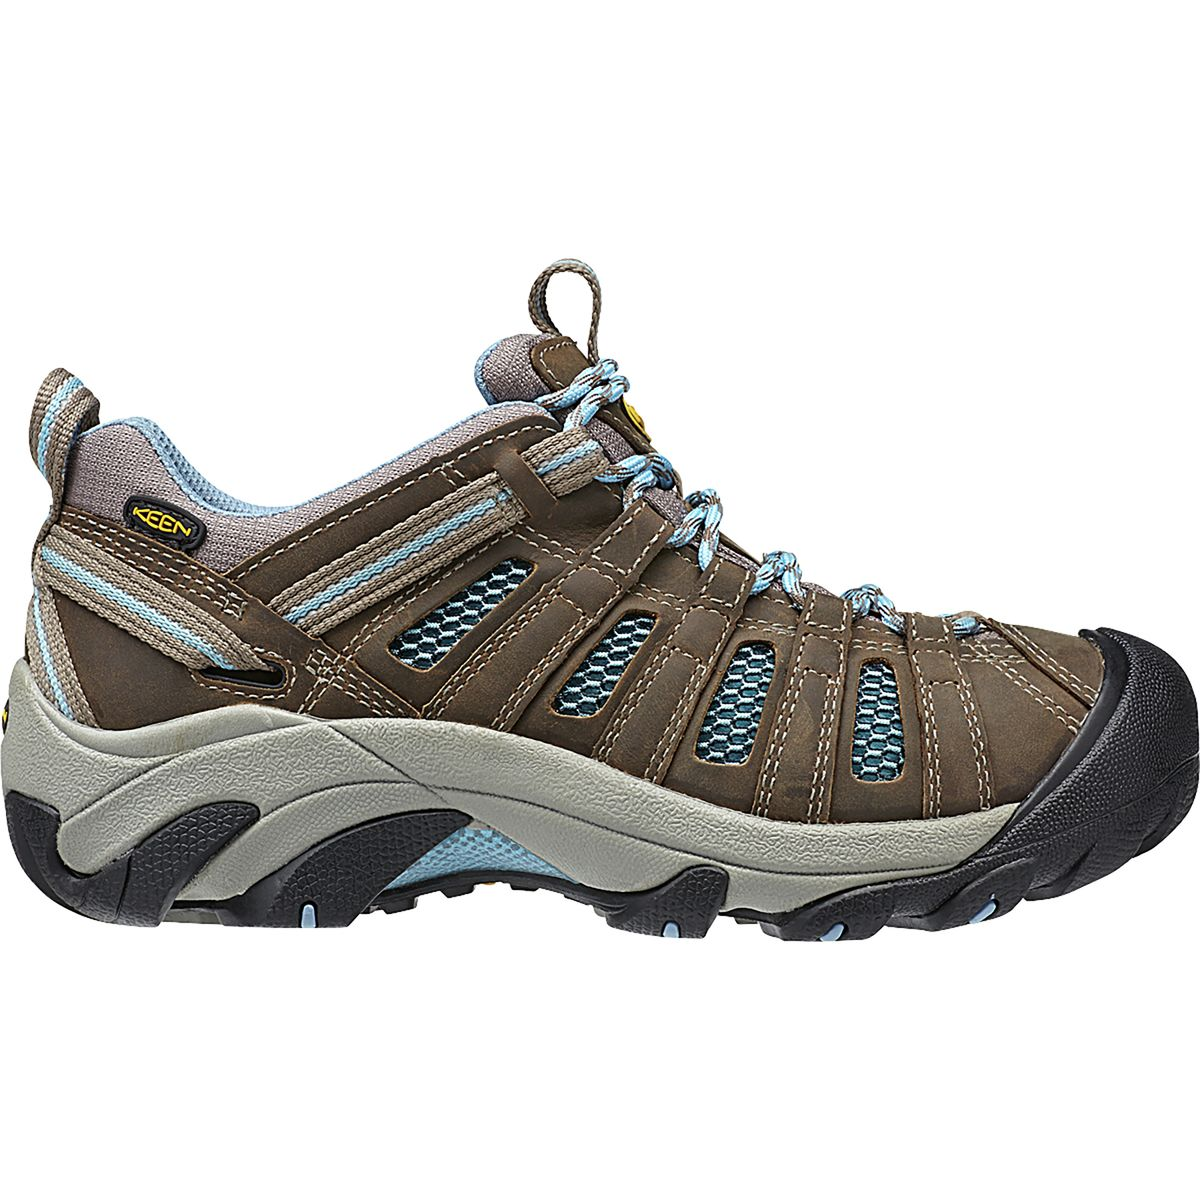 photo: Keen Women's Voyageur trail shoe